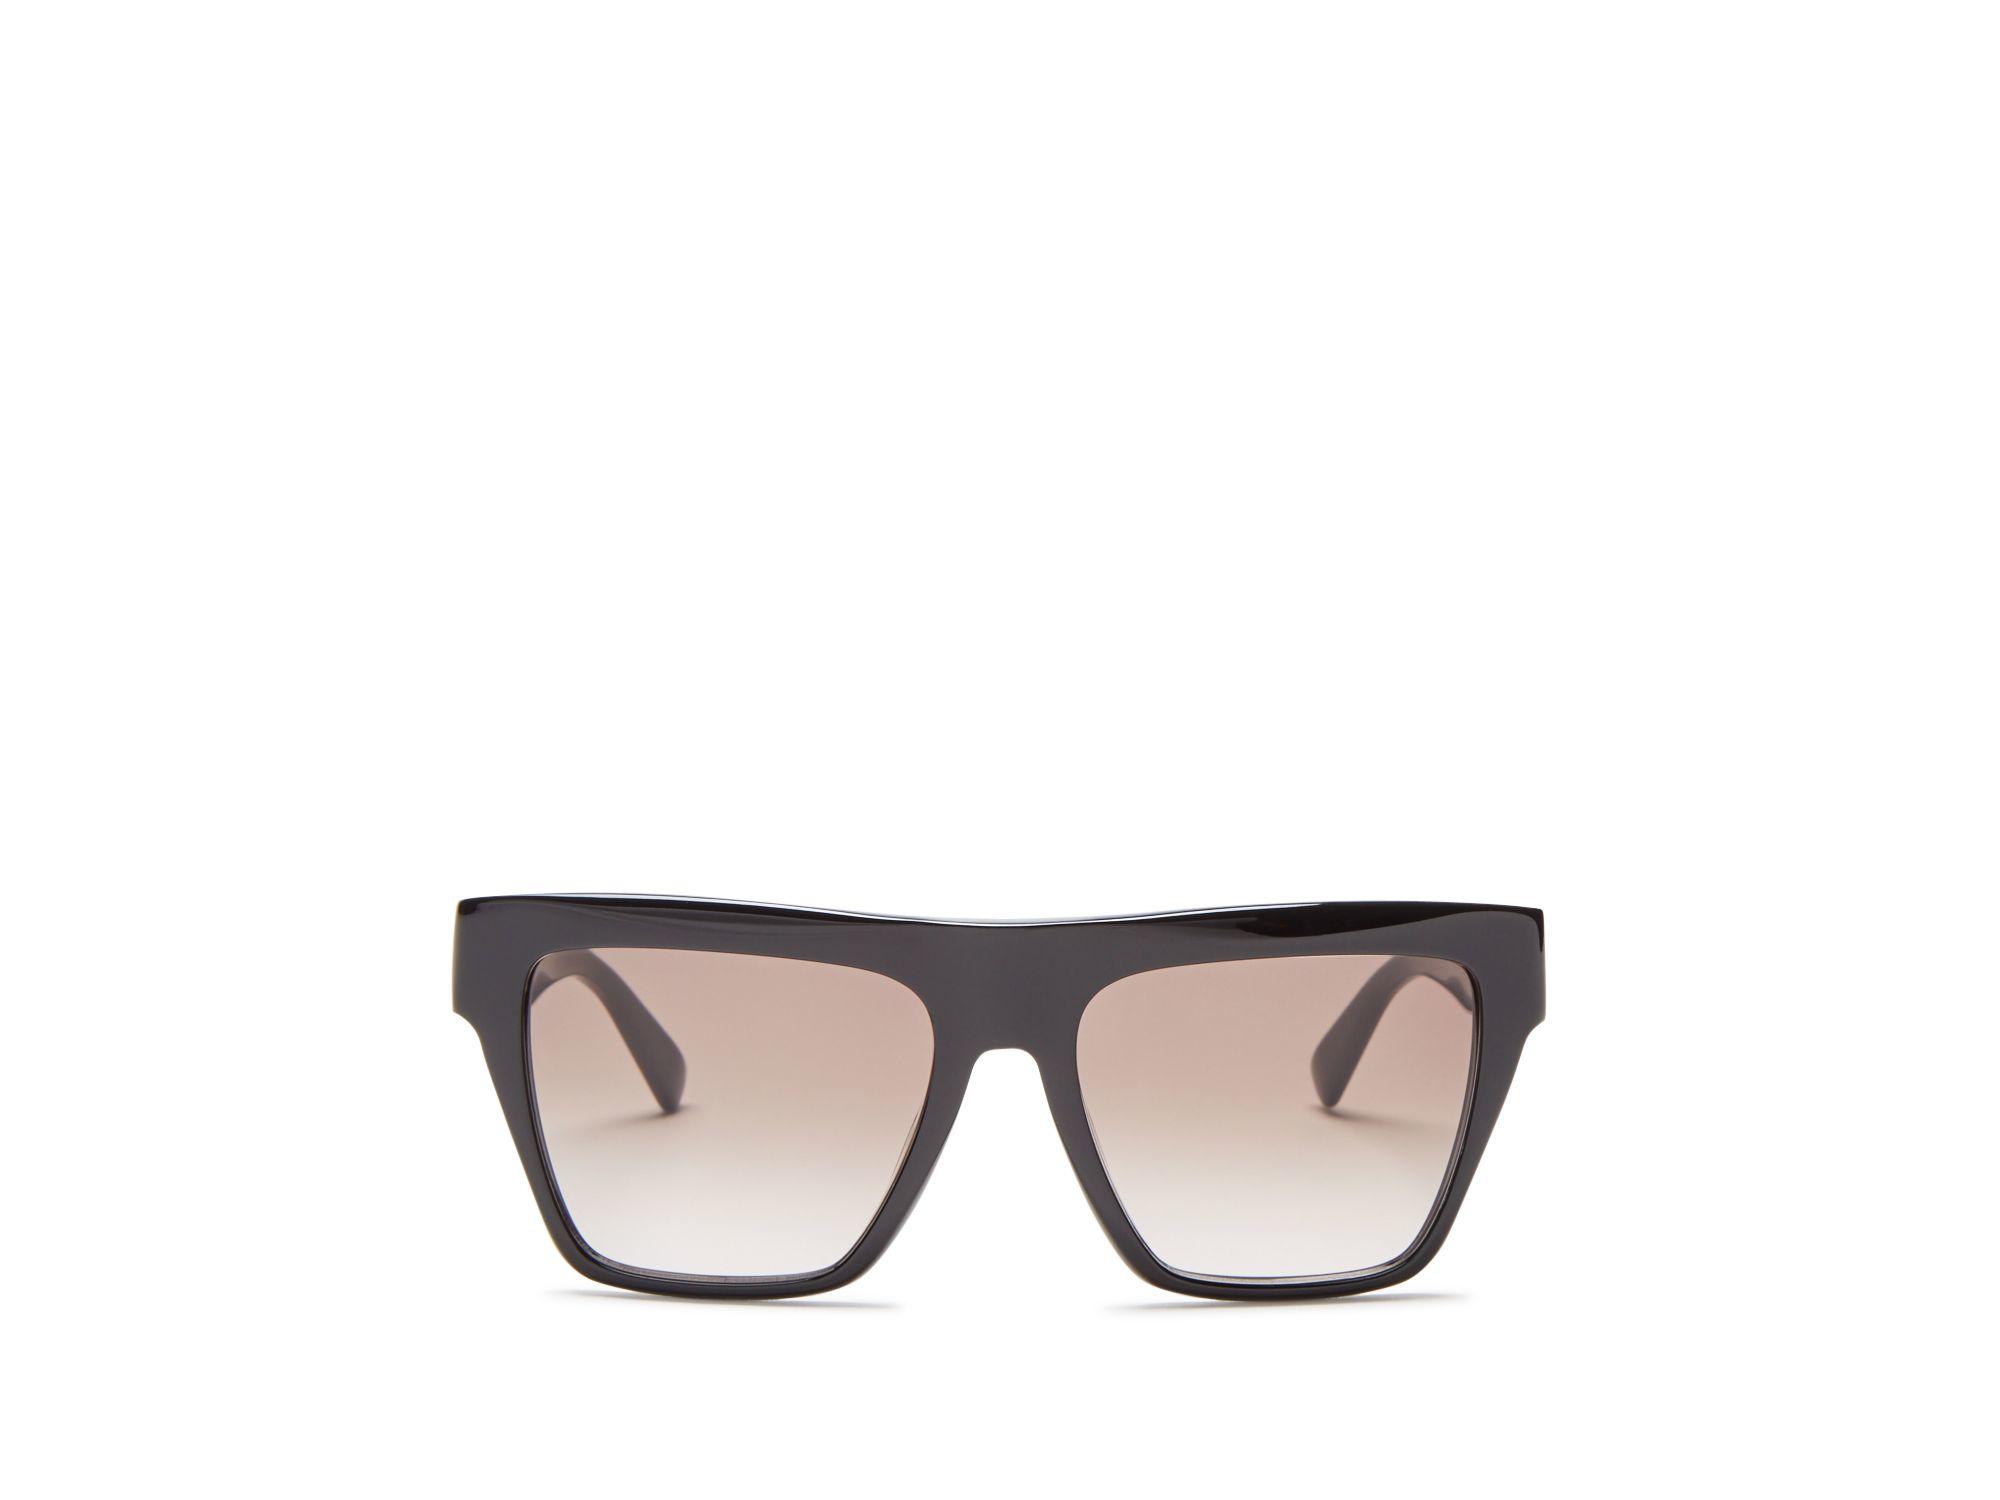 ded96e9da9e mcm-black-black-gradient-lens-square-flat-top-sunglasses -black-product-1-128281114-normal.jpeg